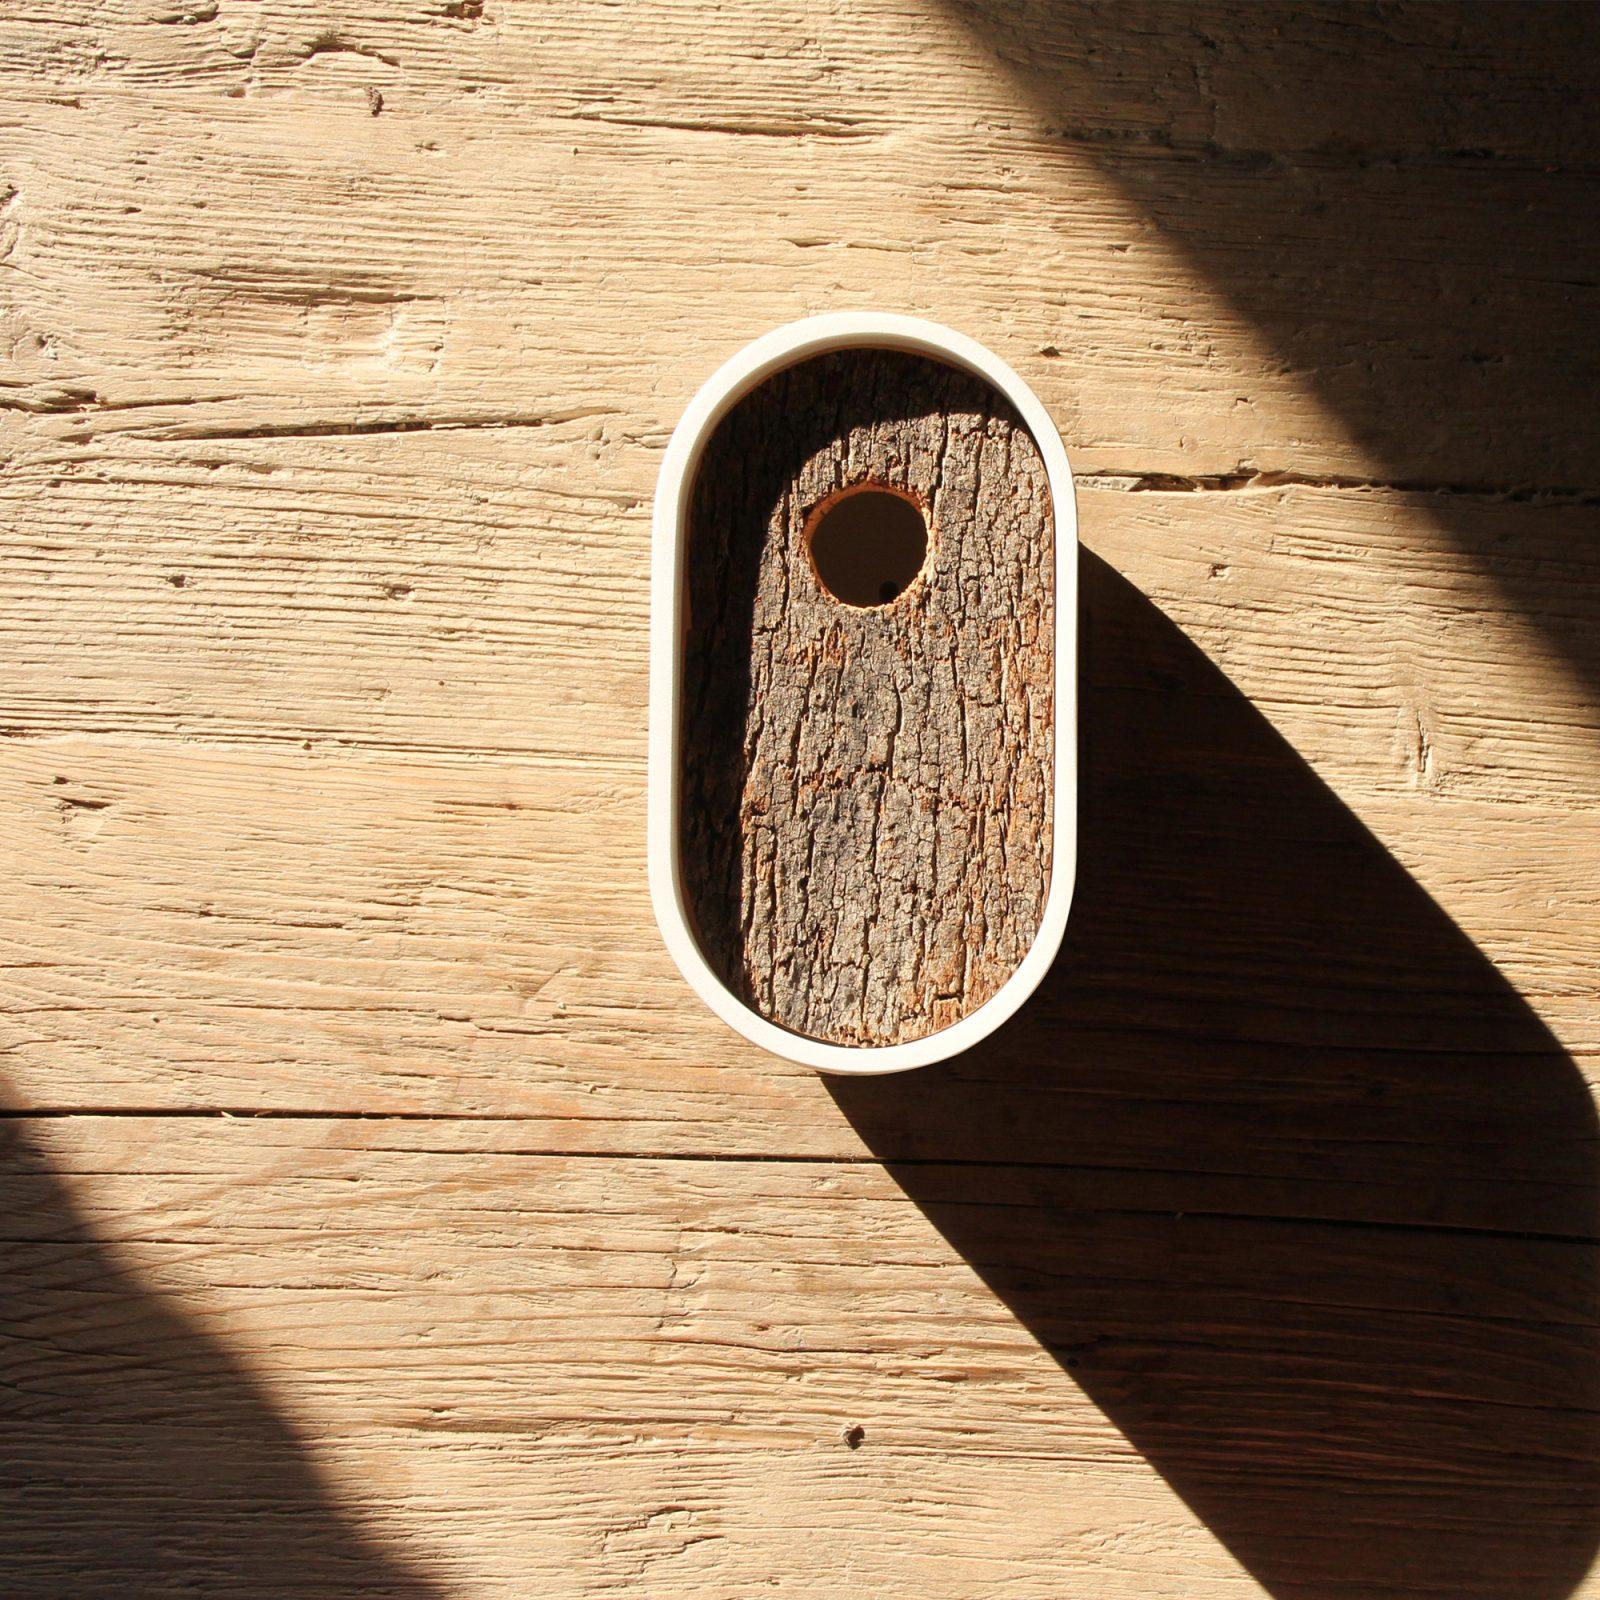 hole-inn-concrete-cork-birdhouse-5